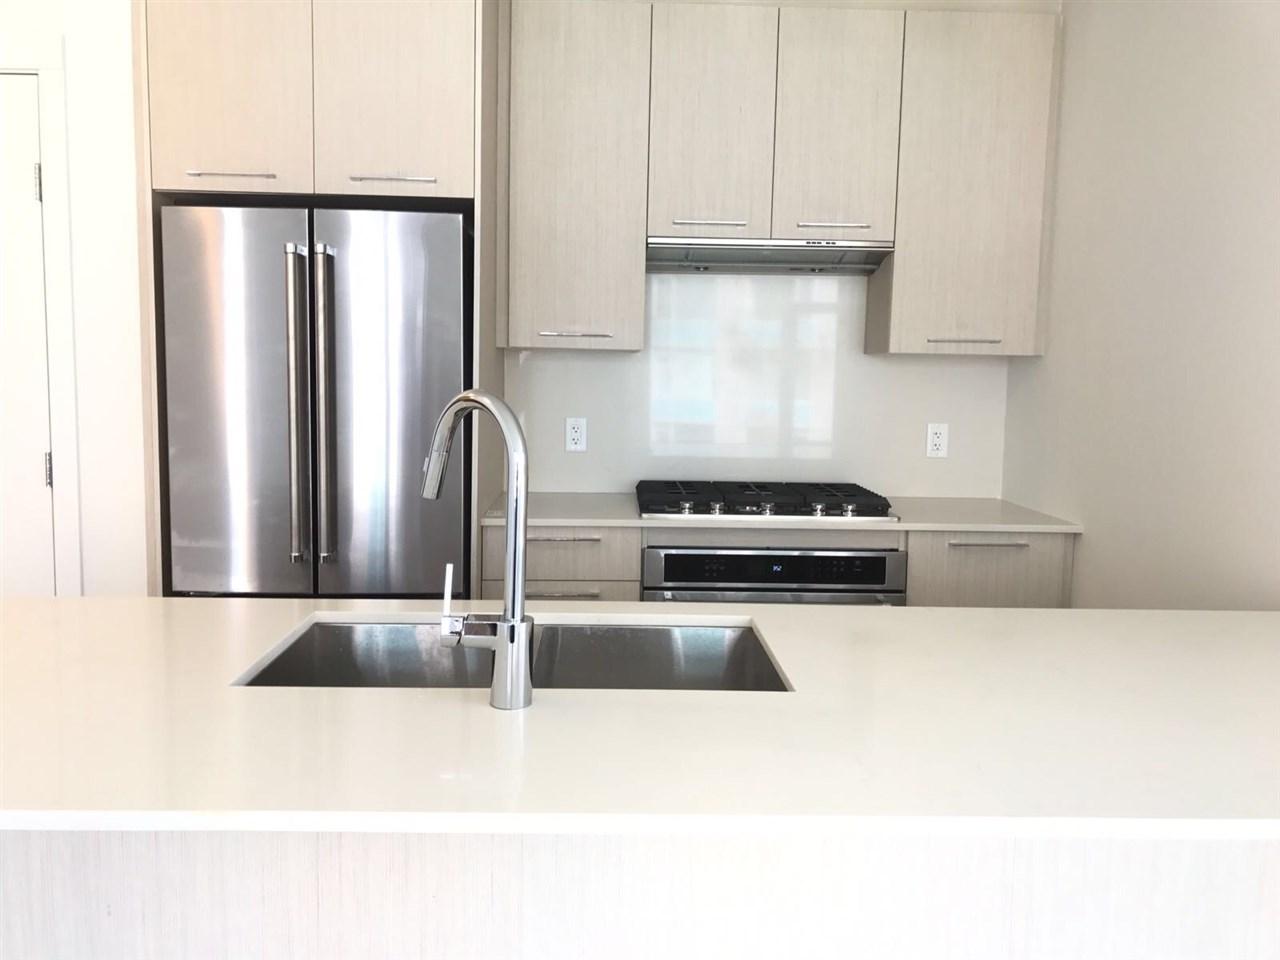 Condo Apartment at 509 5619 CEDARBRIDGE WAY, Unit 509, Richmond, British Columbia. Image 5